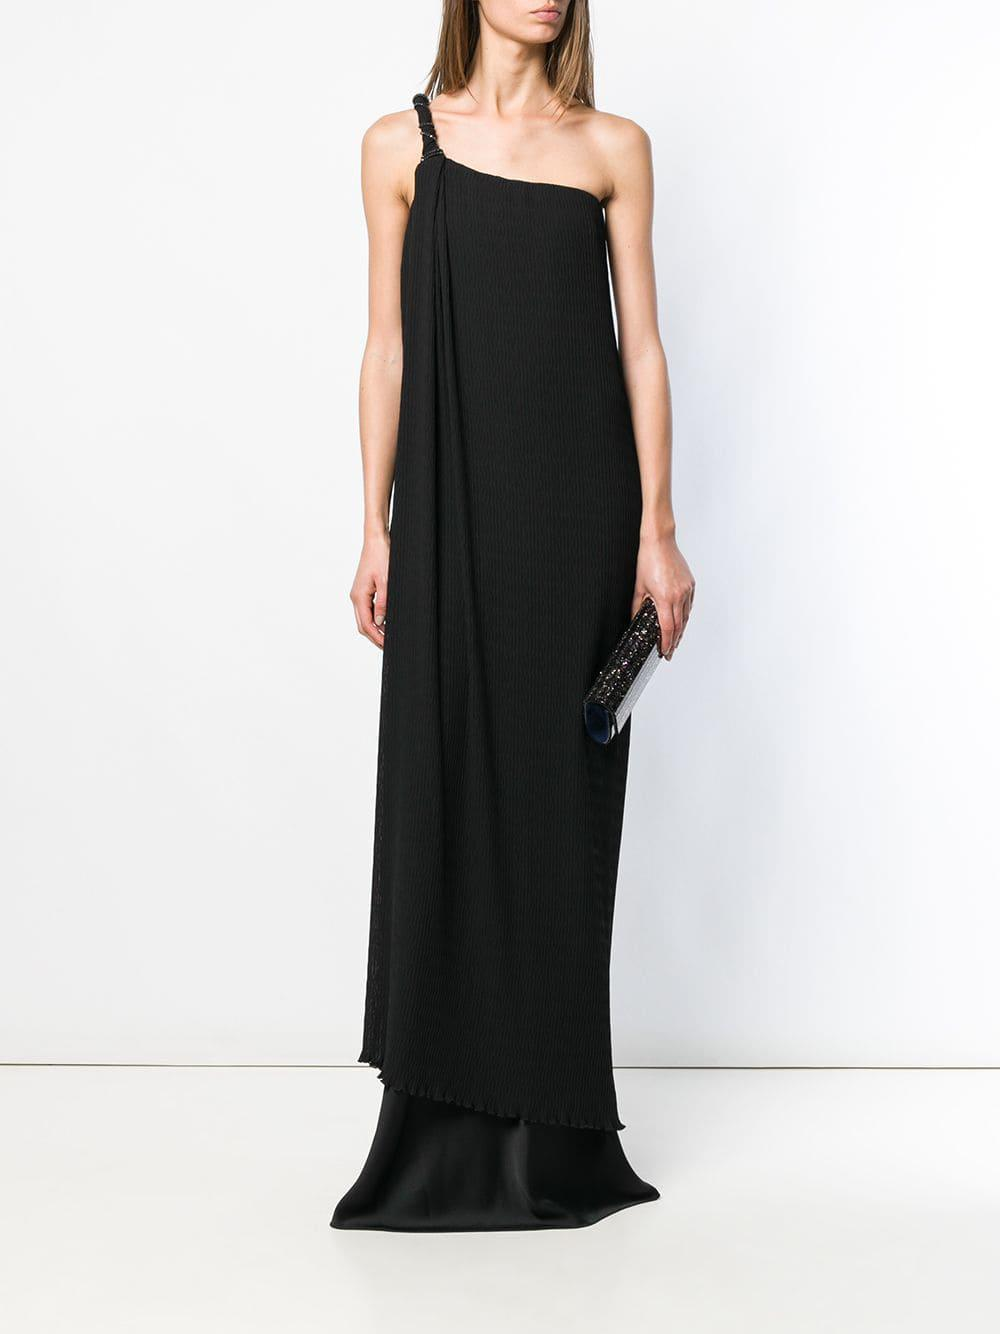 0e584712cdb1 Lyst - Max Mara Asymmetric Dress in Black